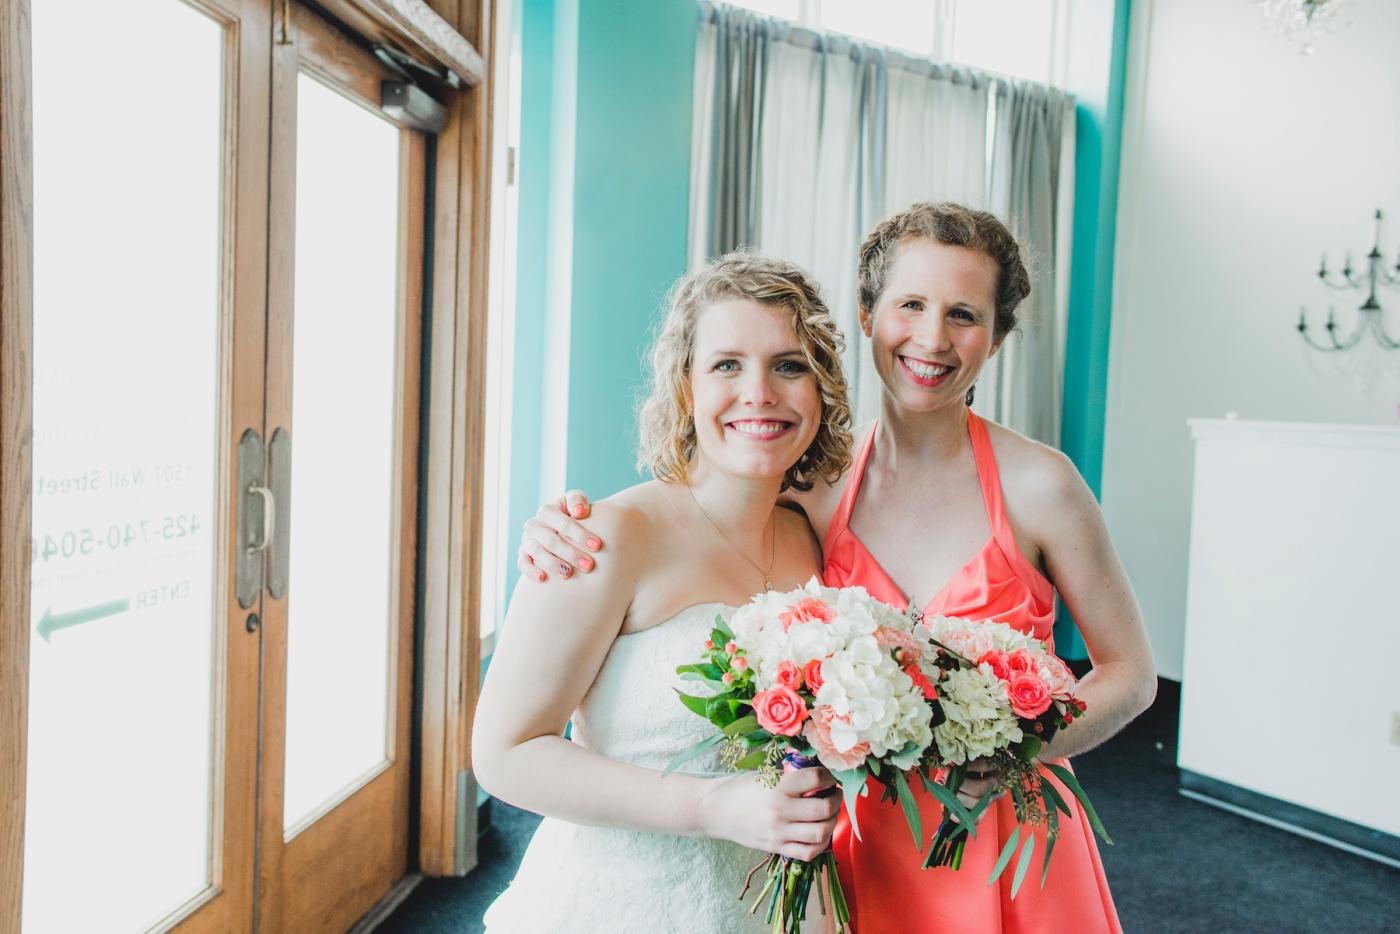 DSC_2832Everett_Wedding_Ballroom_Jane_Speleers_photography_Rachel_and_Edmund_bridesmaids_2017